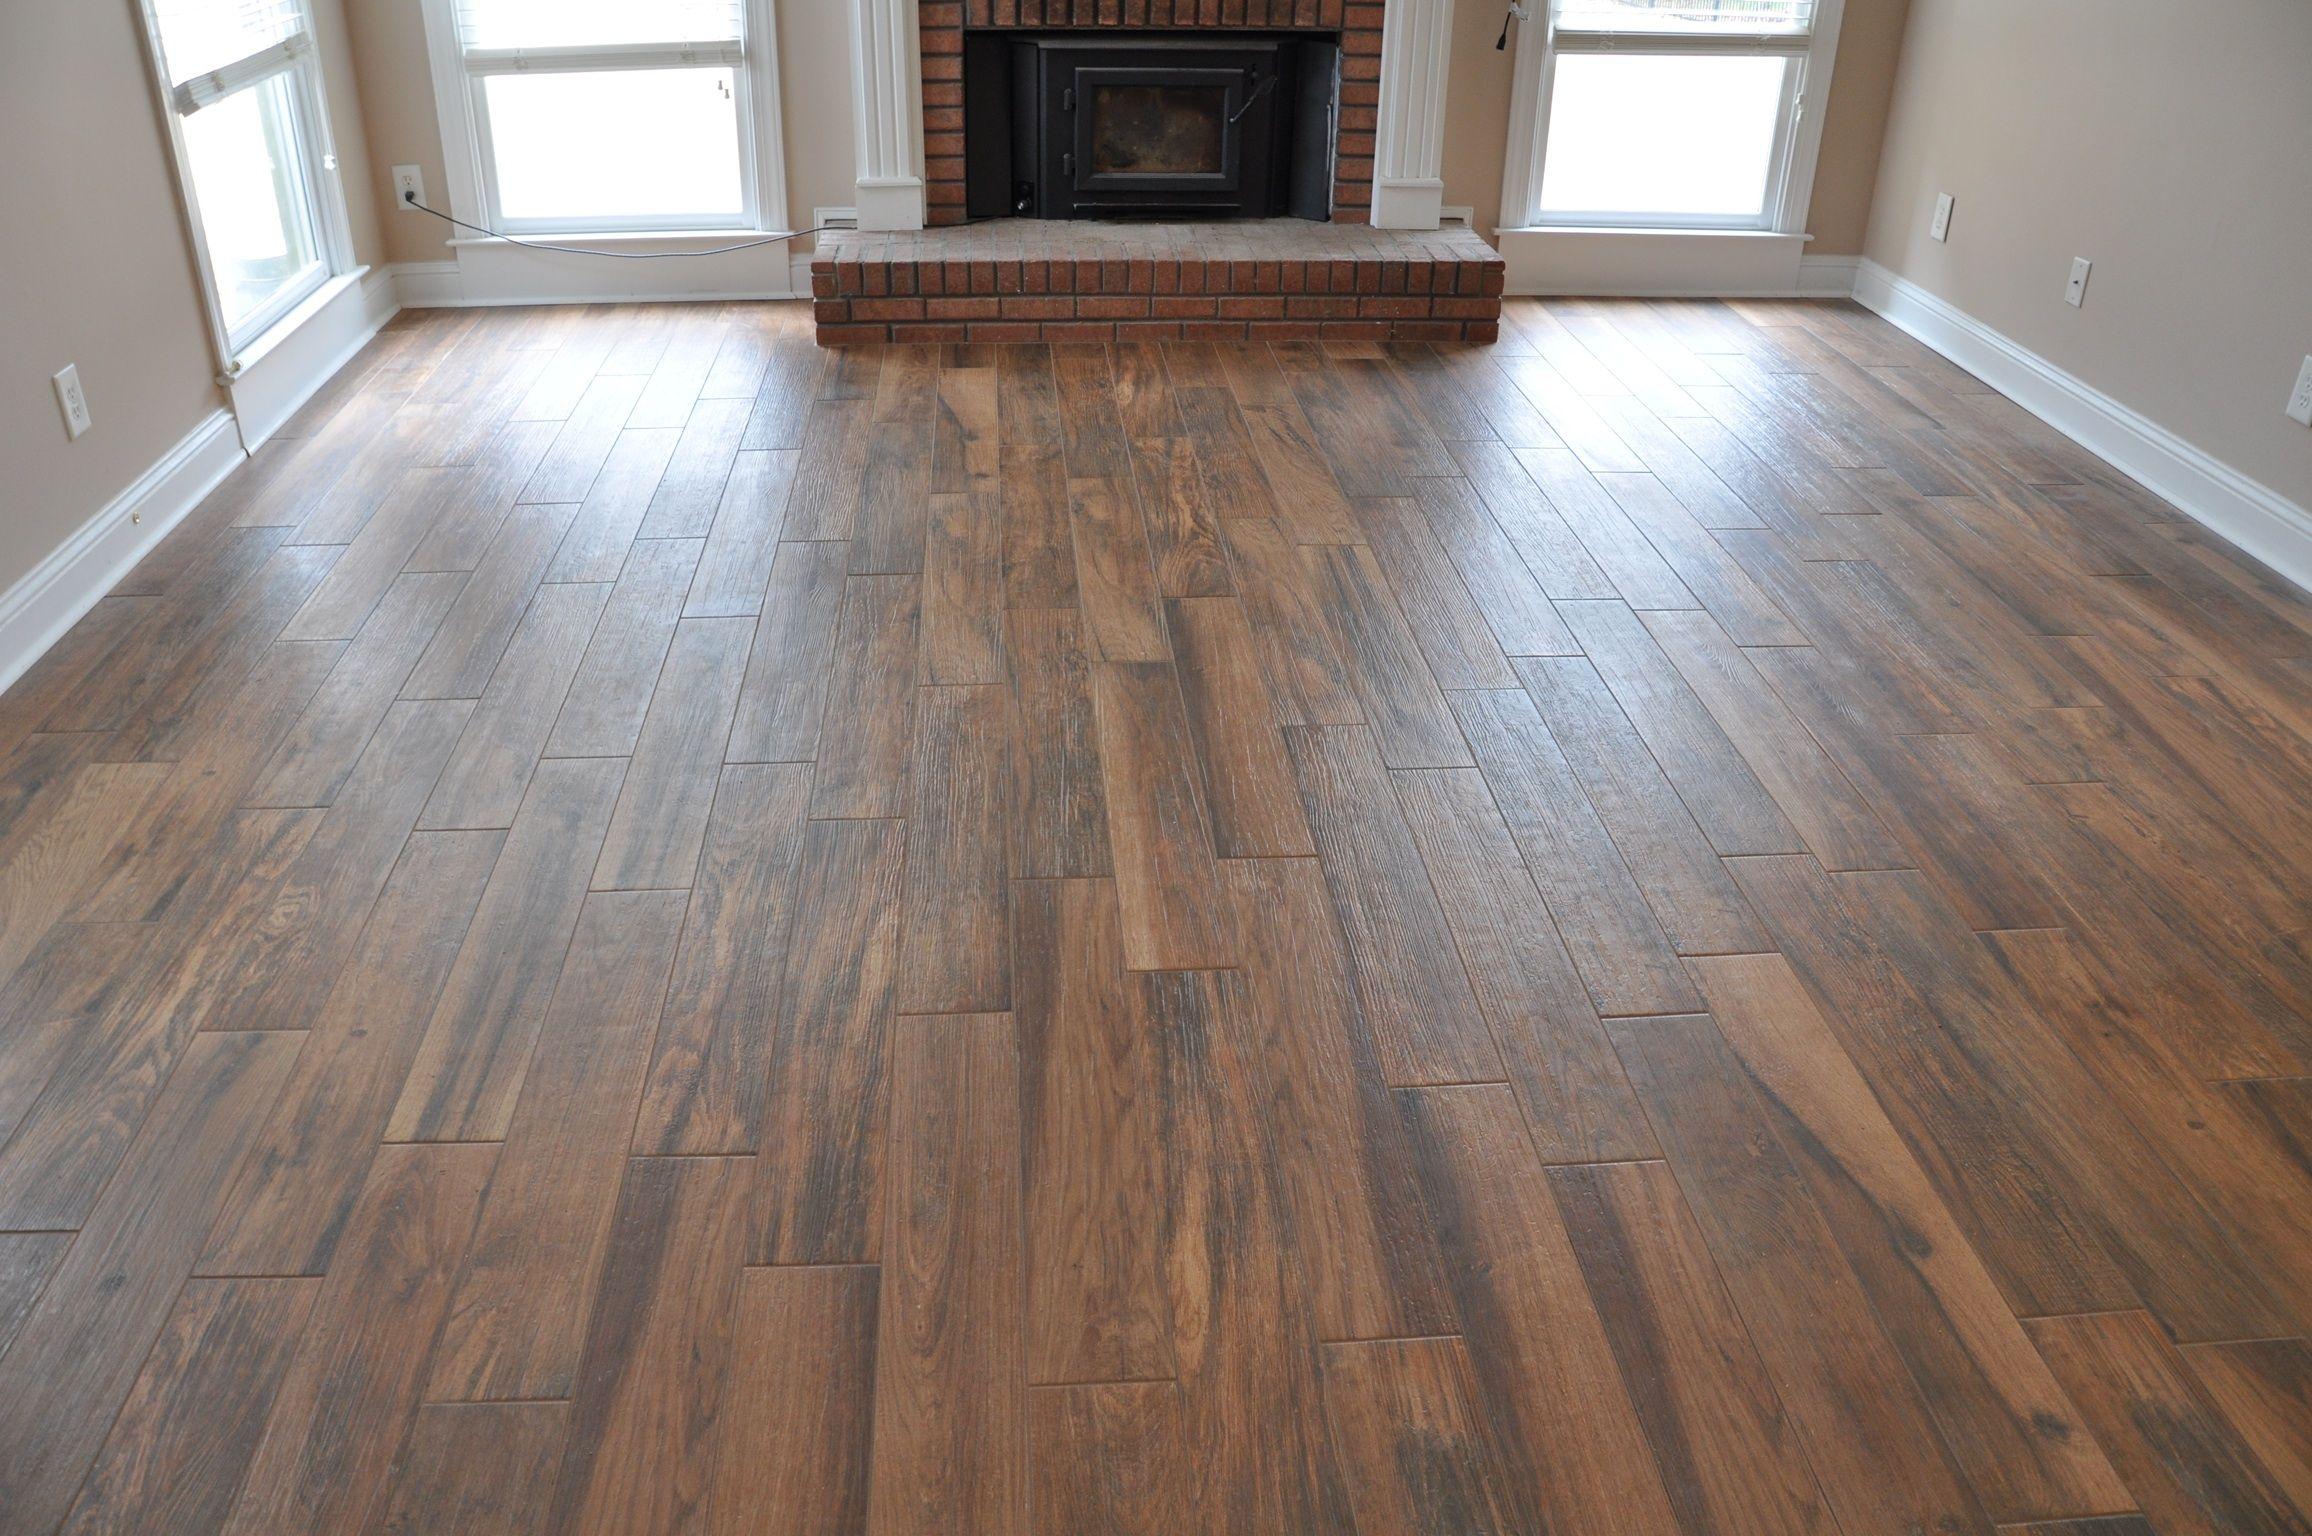 wood look porcelain tile  Google Search  Flooring